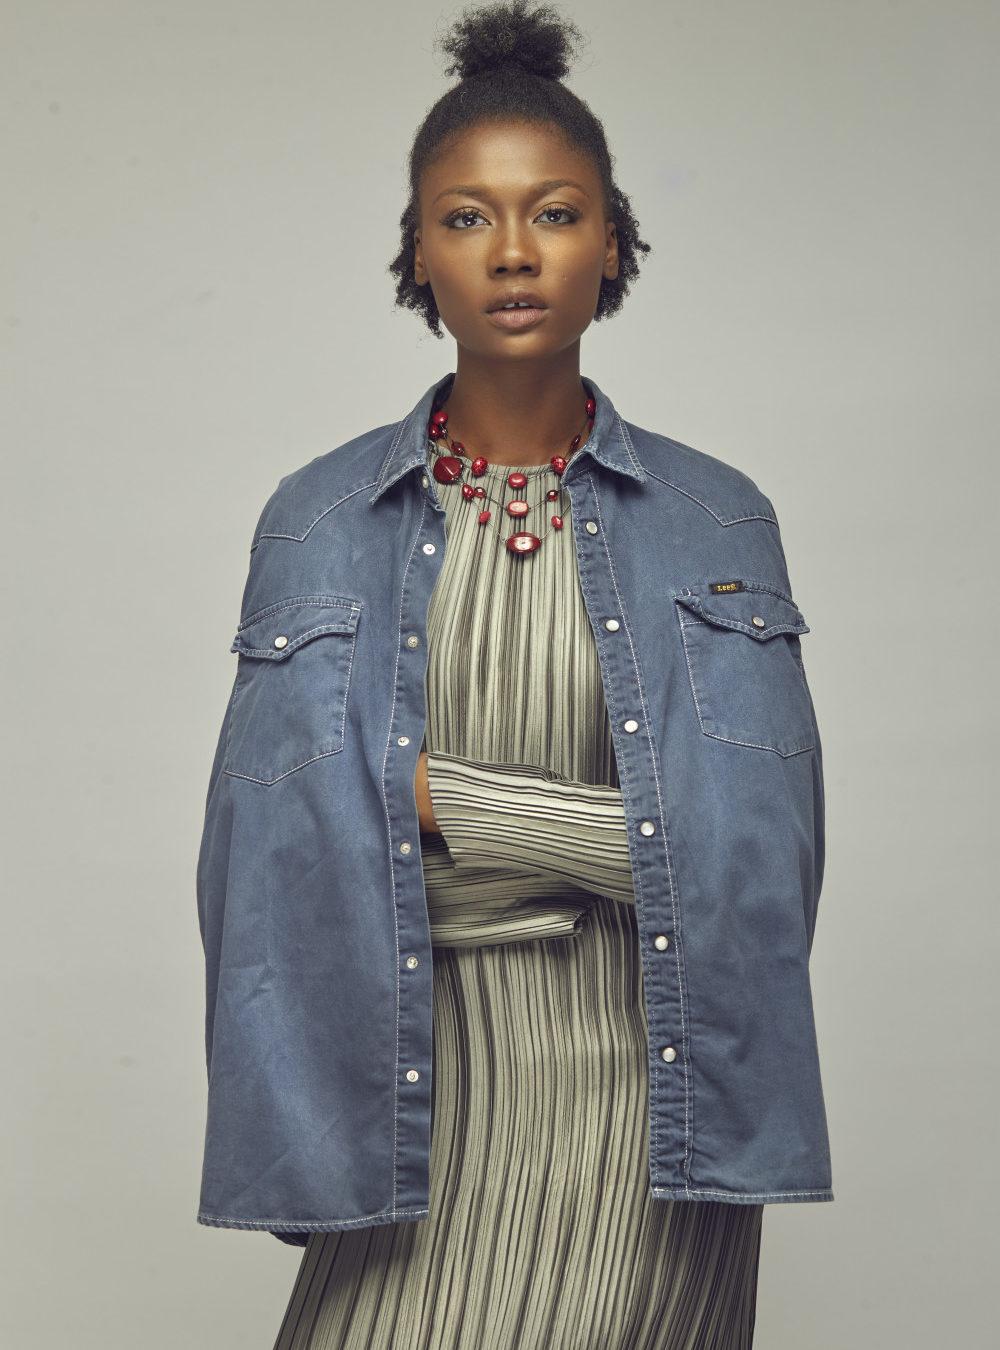 Oyinkansola Momoh - Haute Fashion Africa (HFA)